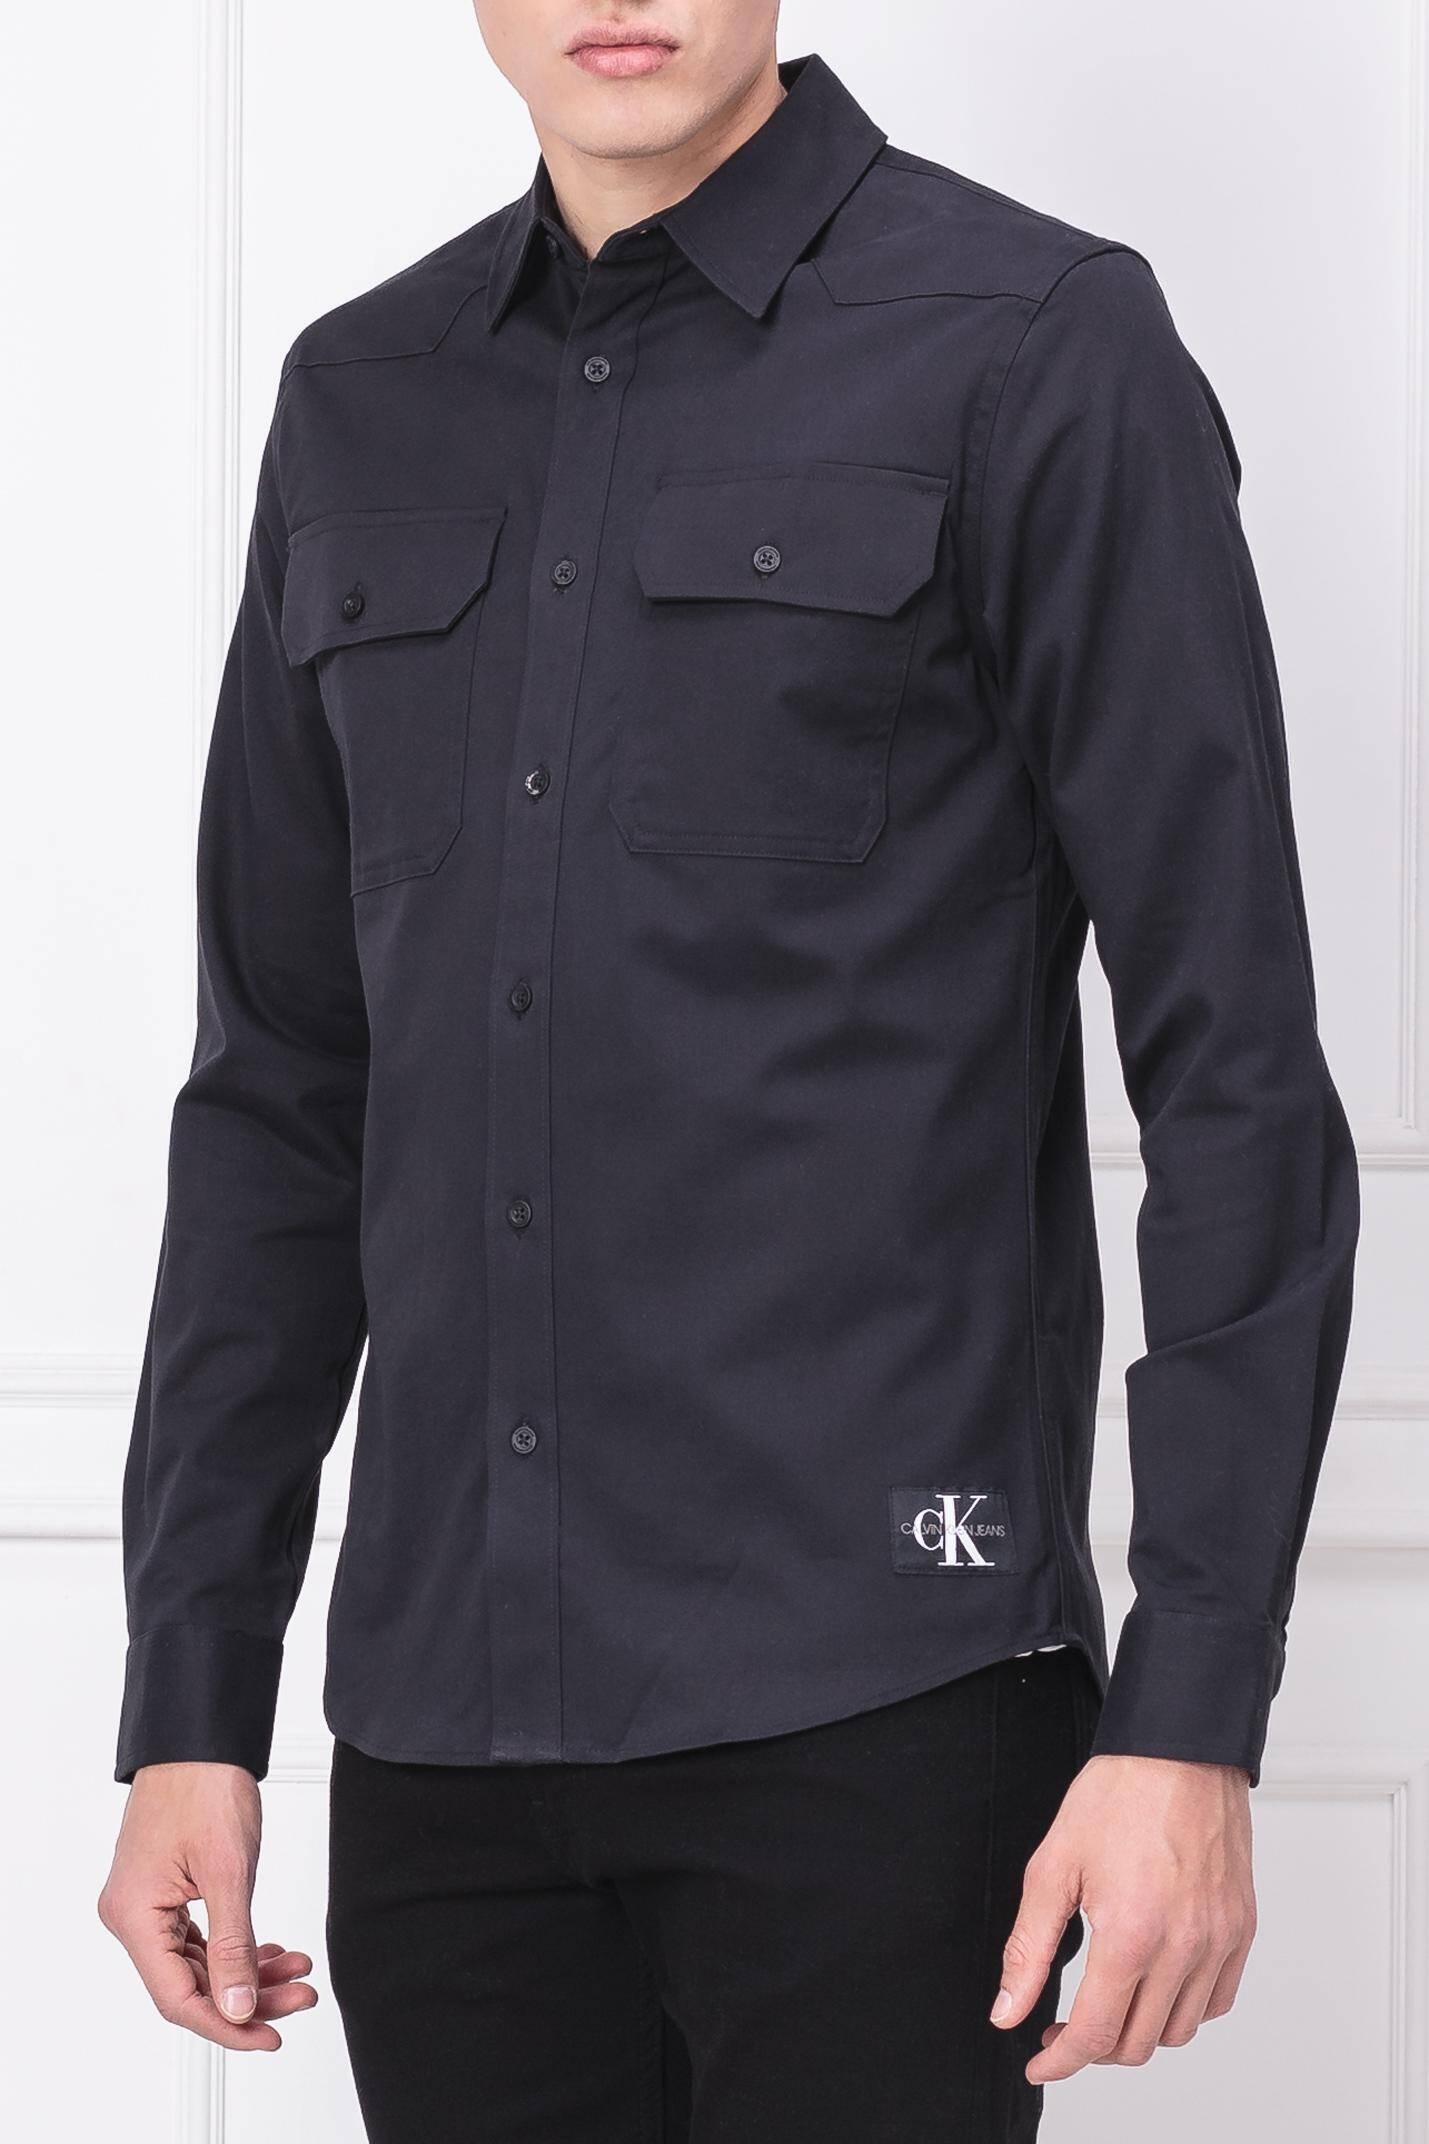 2b72d4bfb Shirt WESTERN STRETCH TWILL   Slim Fit Calvin Klein Jeans   Black    Gomez.pl/en